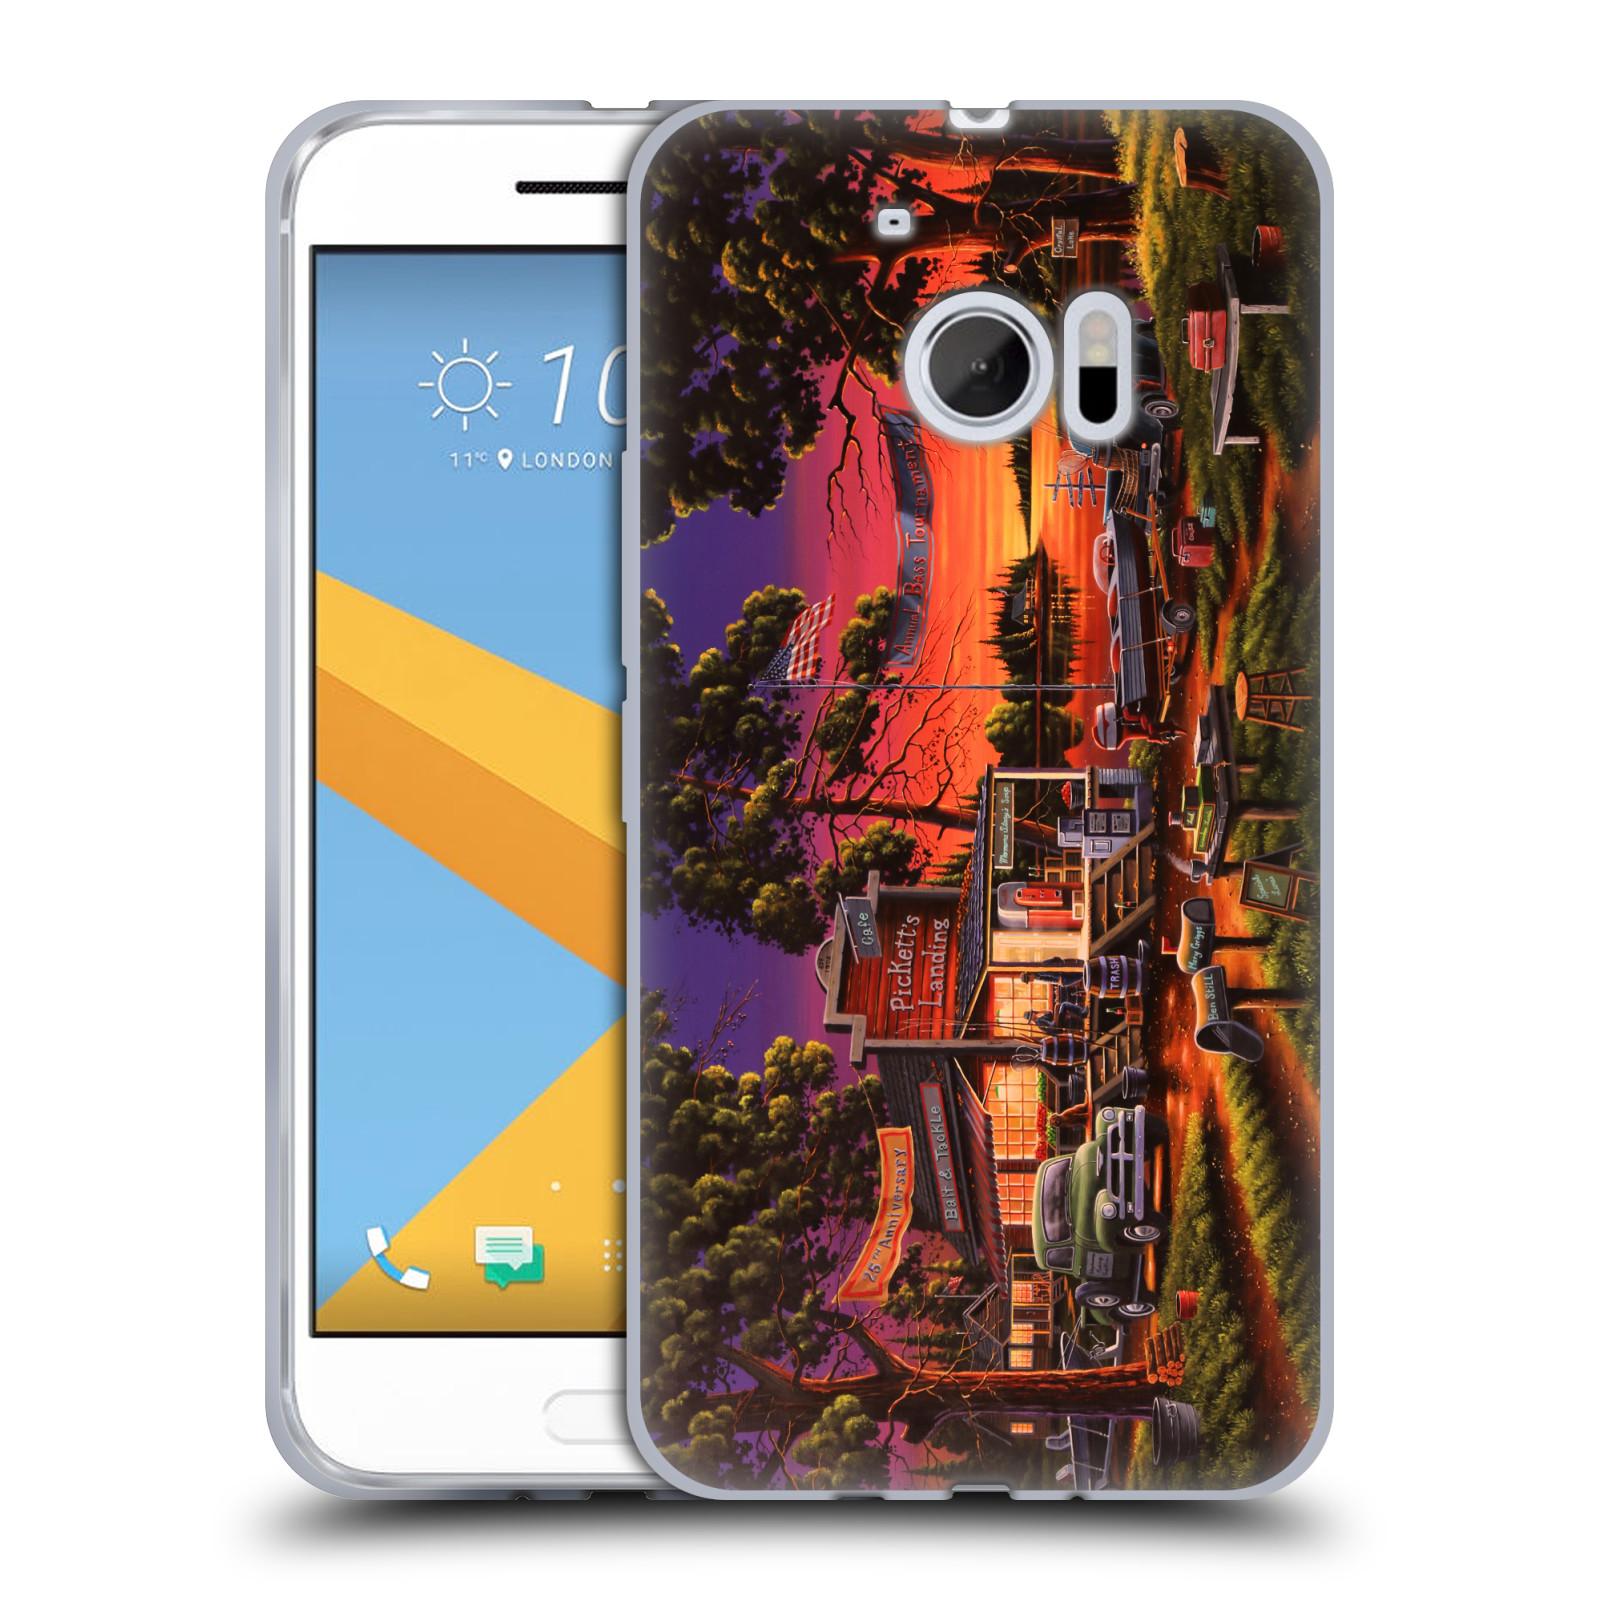 OFFICIAL-GENO-PEOPLES-ART-HALLOWEEN-SOFT-GEL-CASE-FOR-HTC-PHONES-1